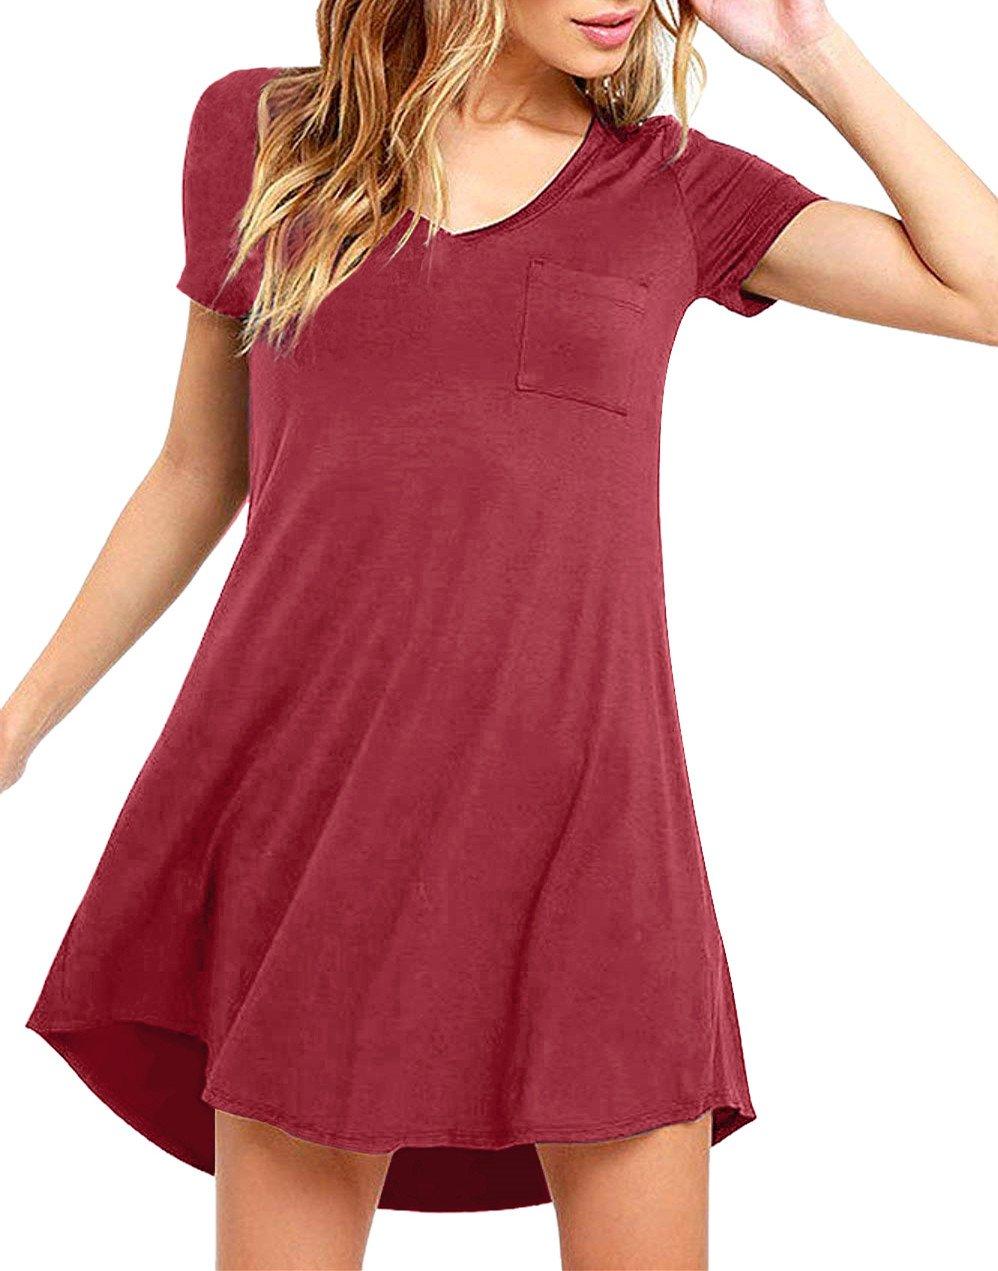 614d4802f54 Eanklosco Womens Casual Short Sleeve Plain Pocket V Neck T Shirt Tunic  Dress (Wine Red